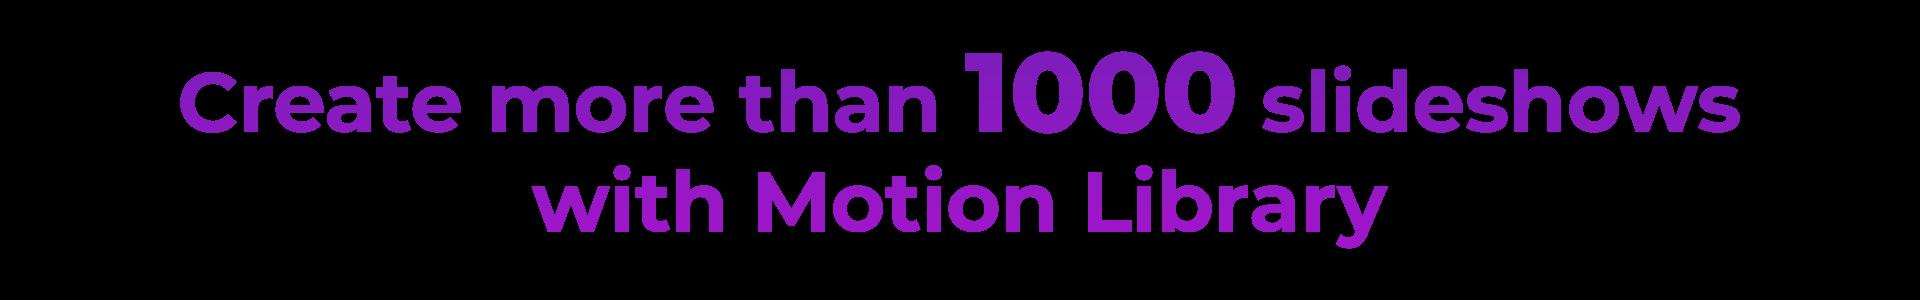 ae模板 2000+motion运动元素资源库 10大分类 Motion Library